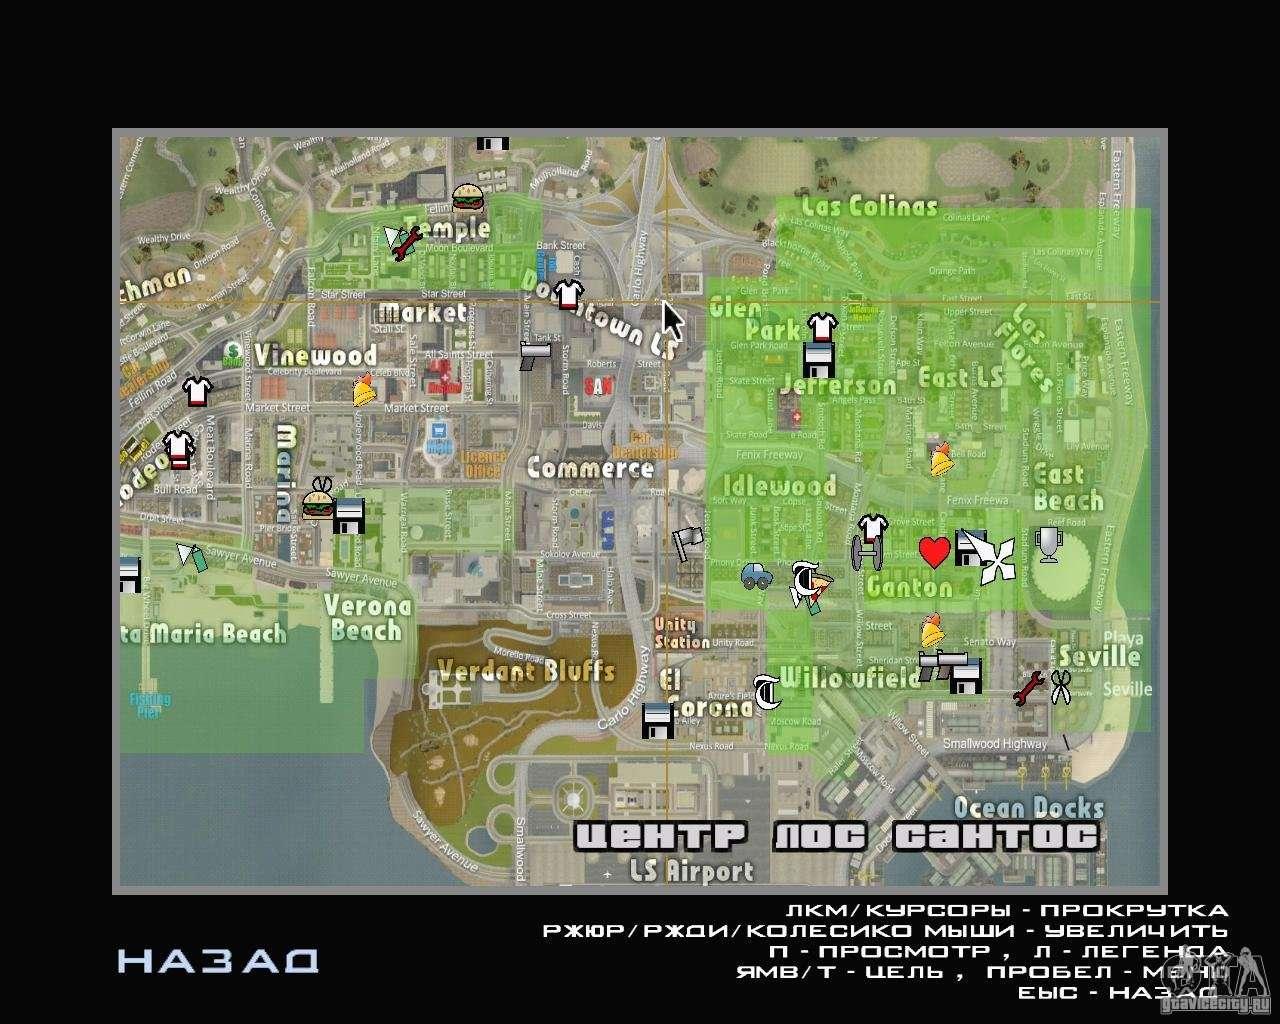 Новые значки карты для GTA San Andreas: www.gtavicecity.ru/gta-san-andreas/mods/11685-novye-znachki-karty.html